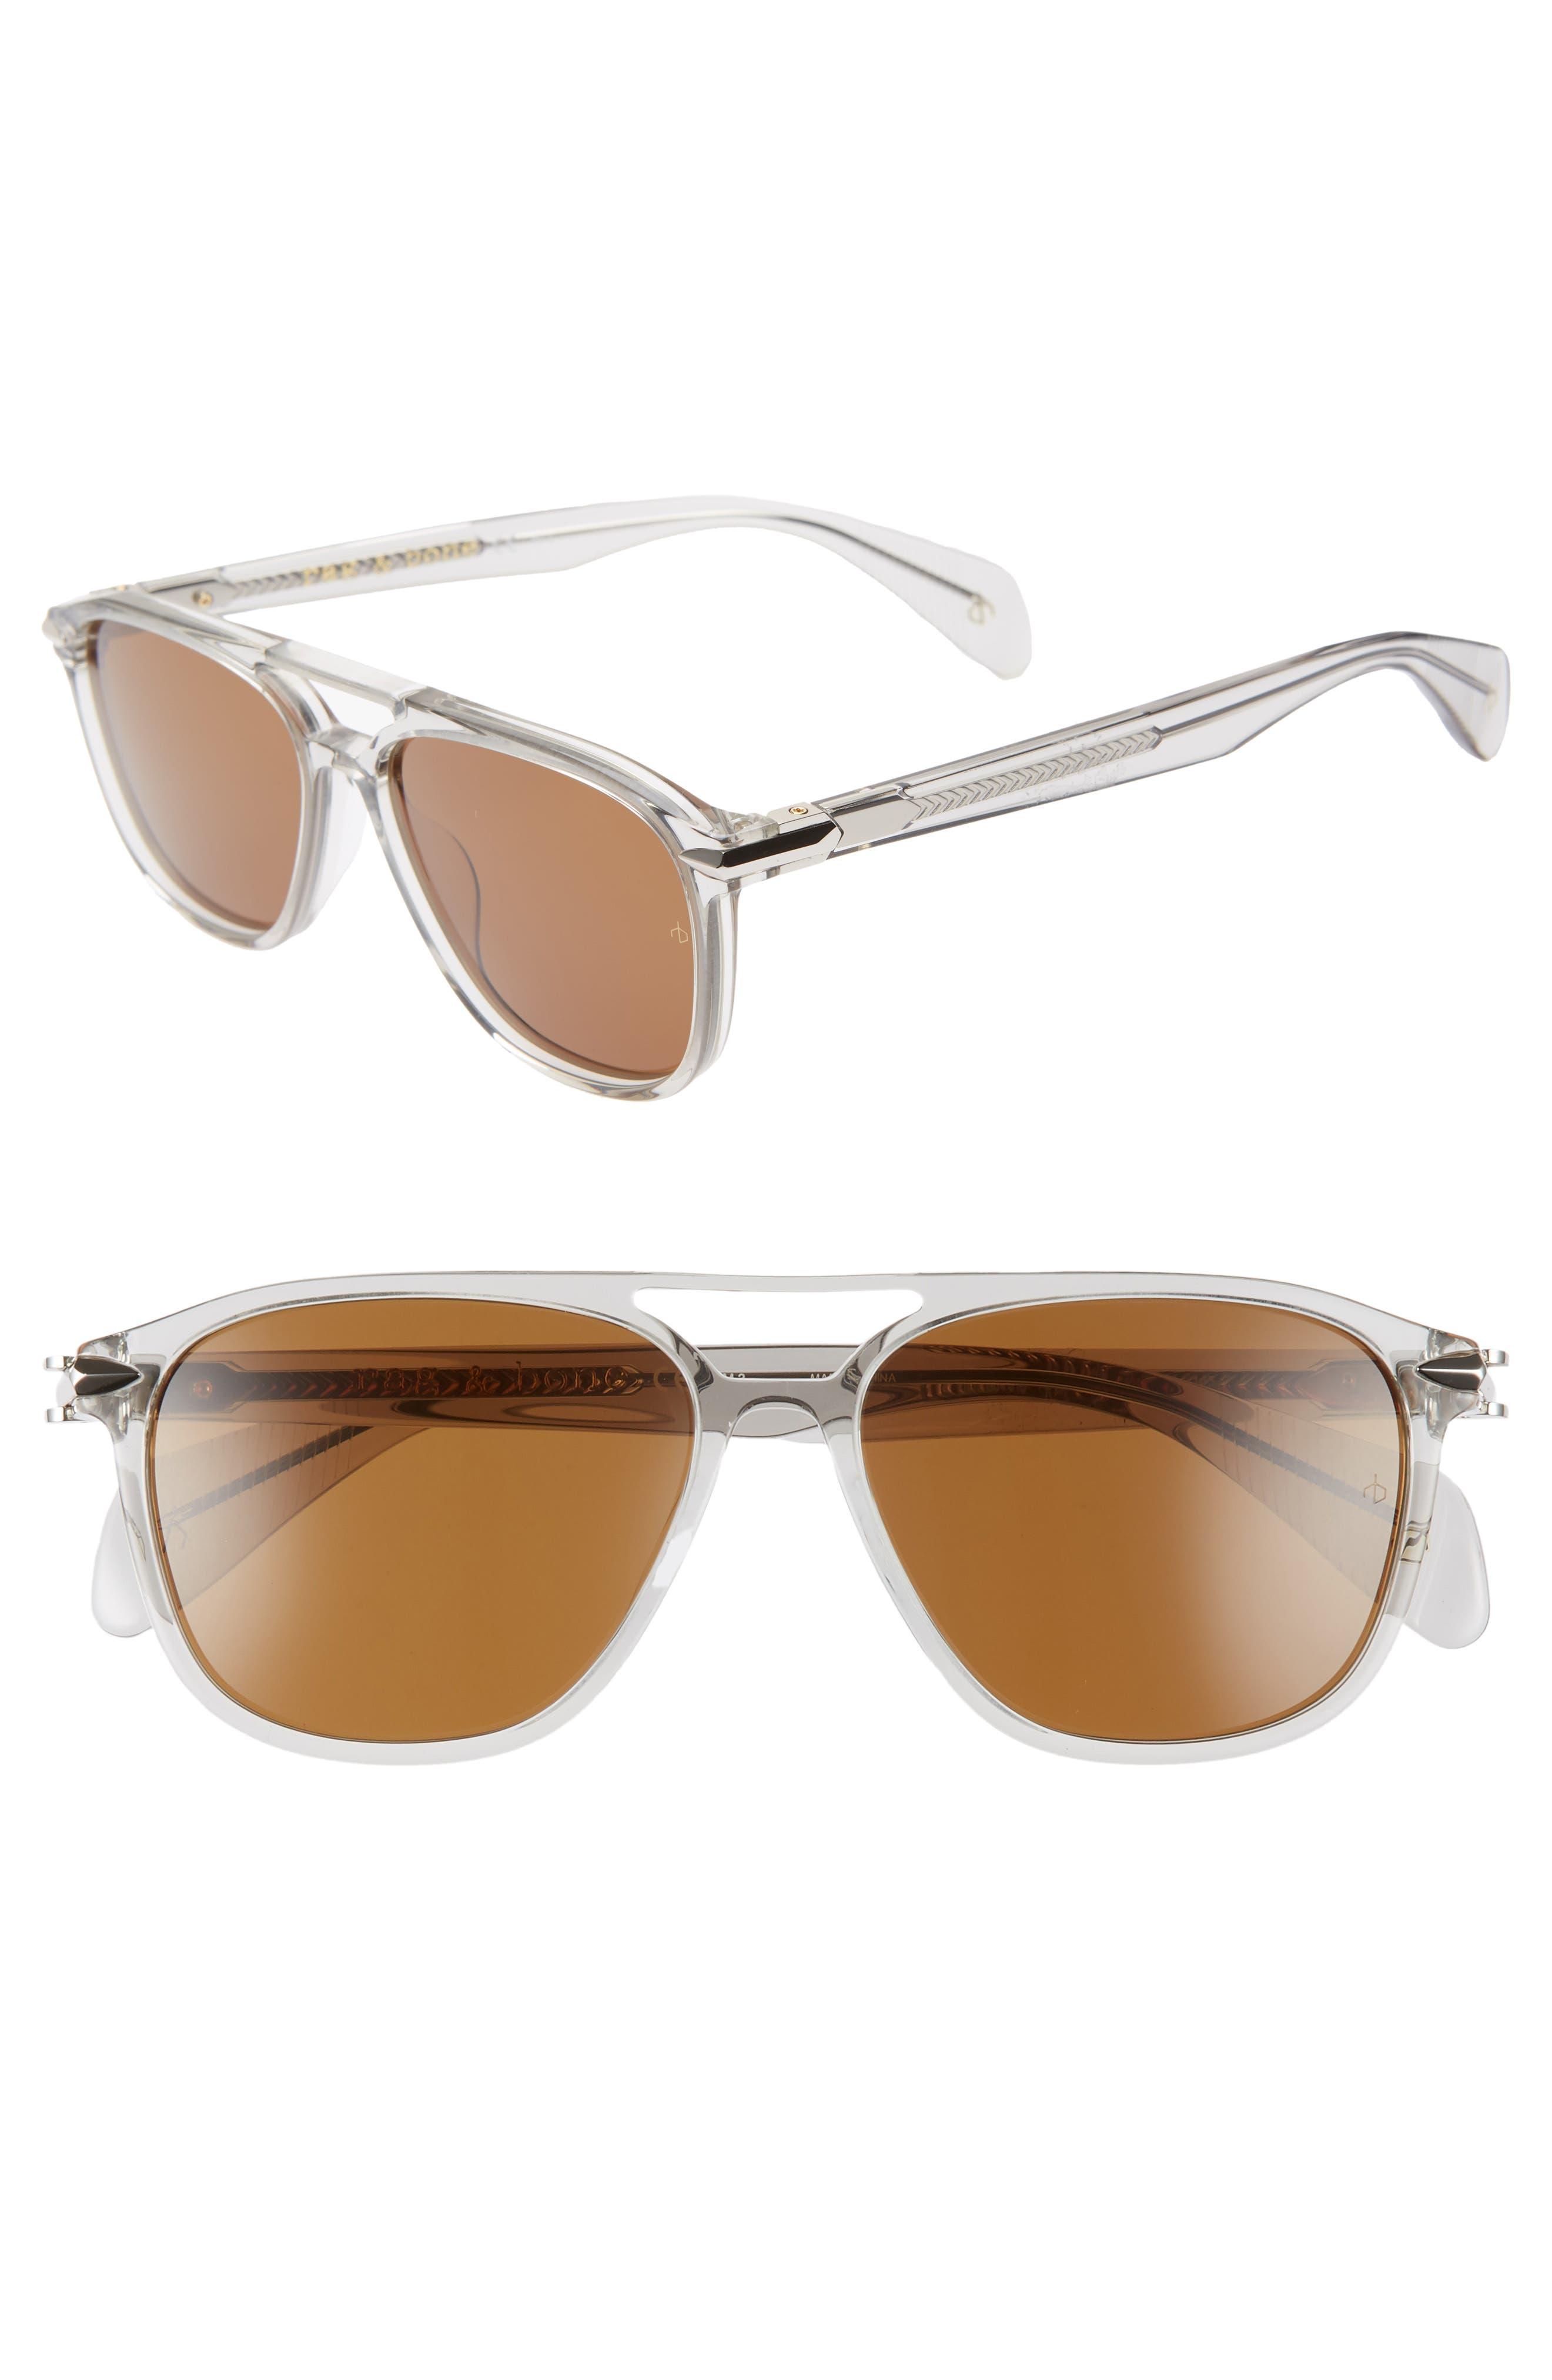 54mm Aviator Sunglasses,                         Main,                         color, GREY